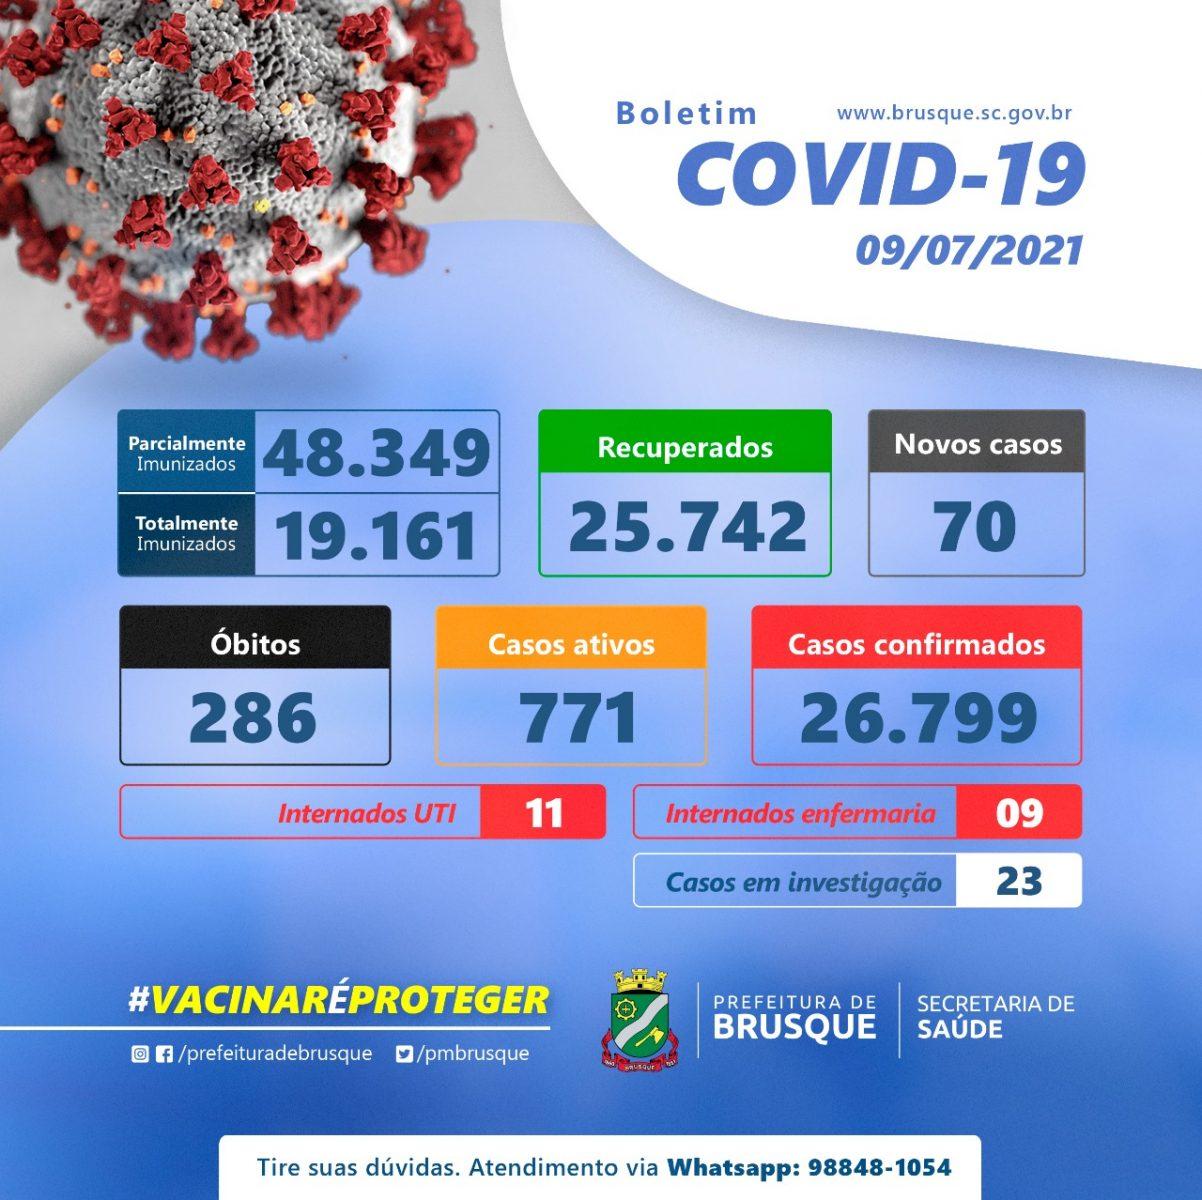 Covid-19: Confira o boletim epidemiológico desta sexta-feira (09)